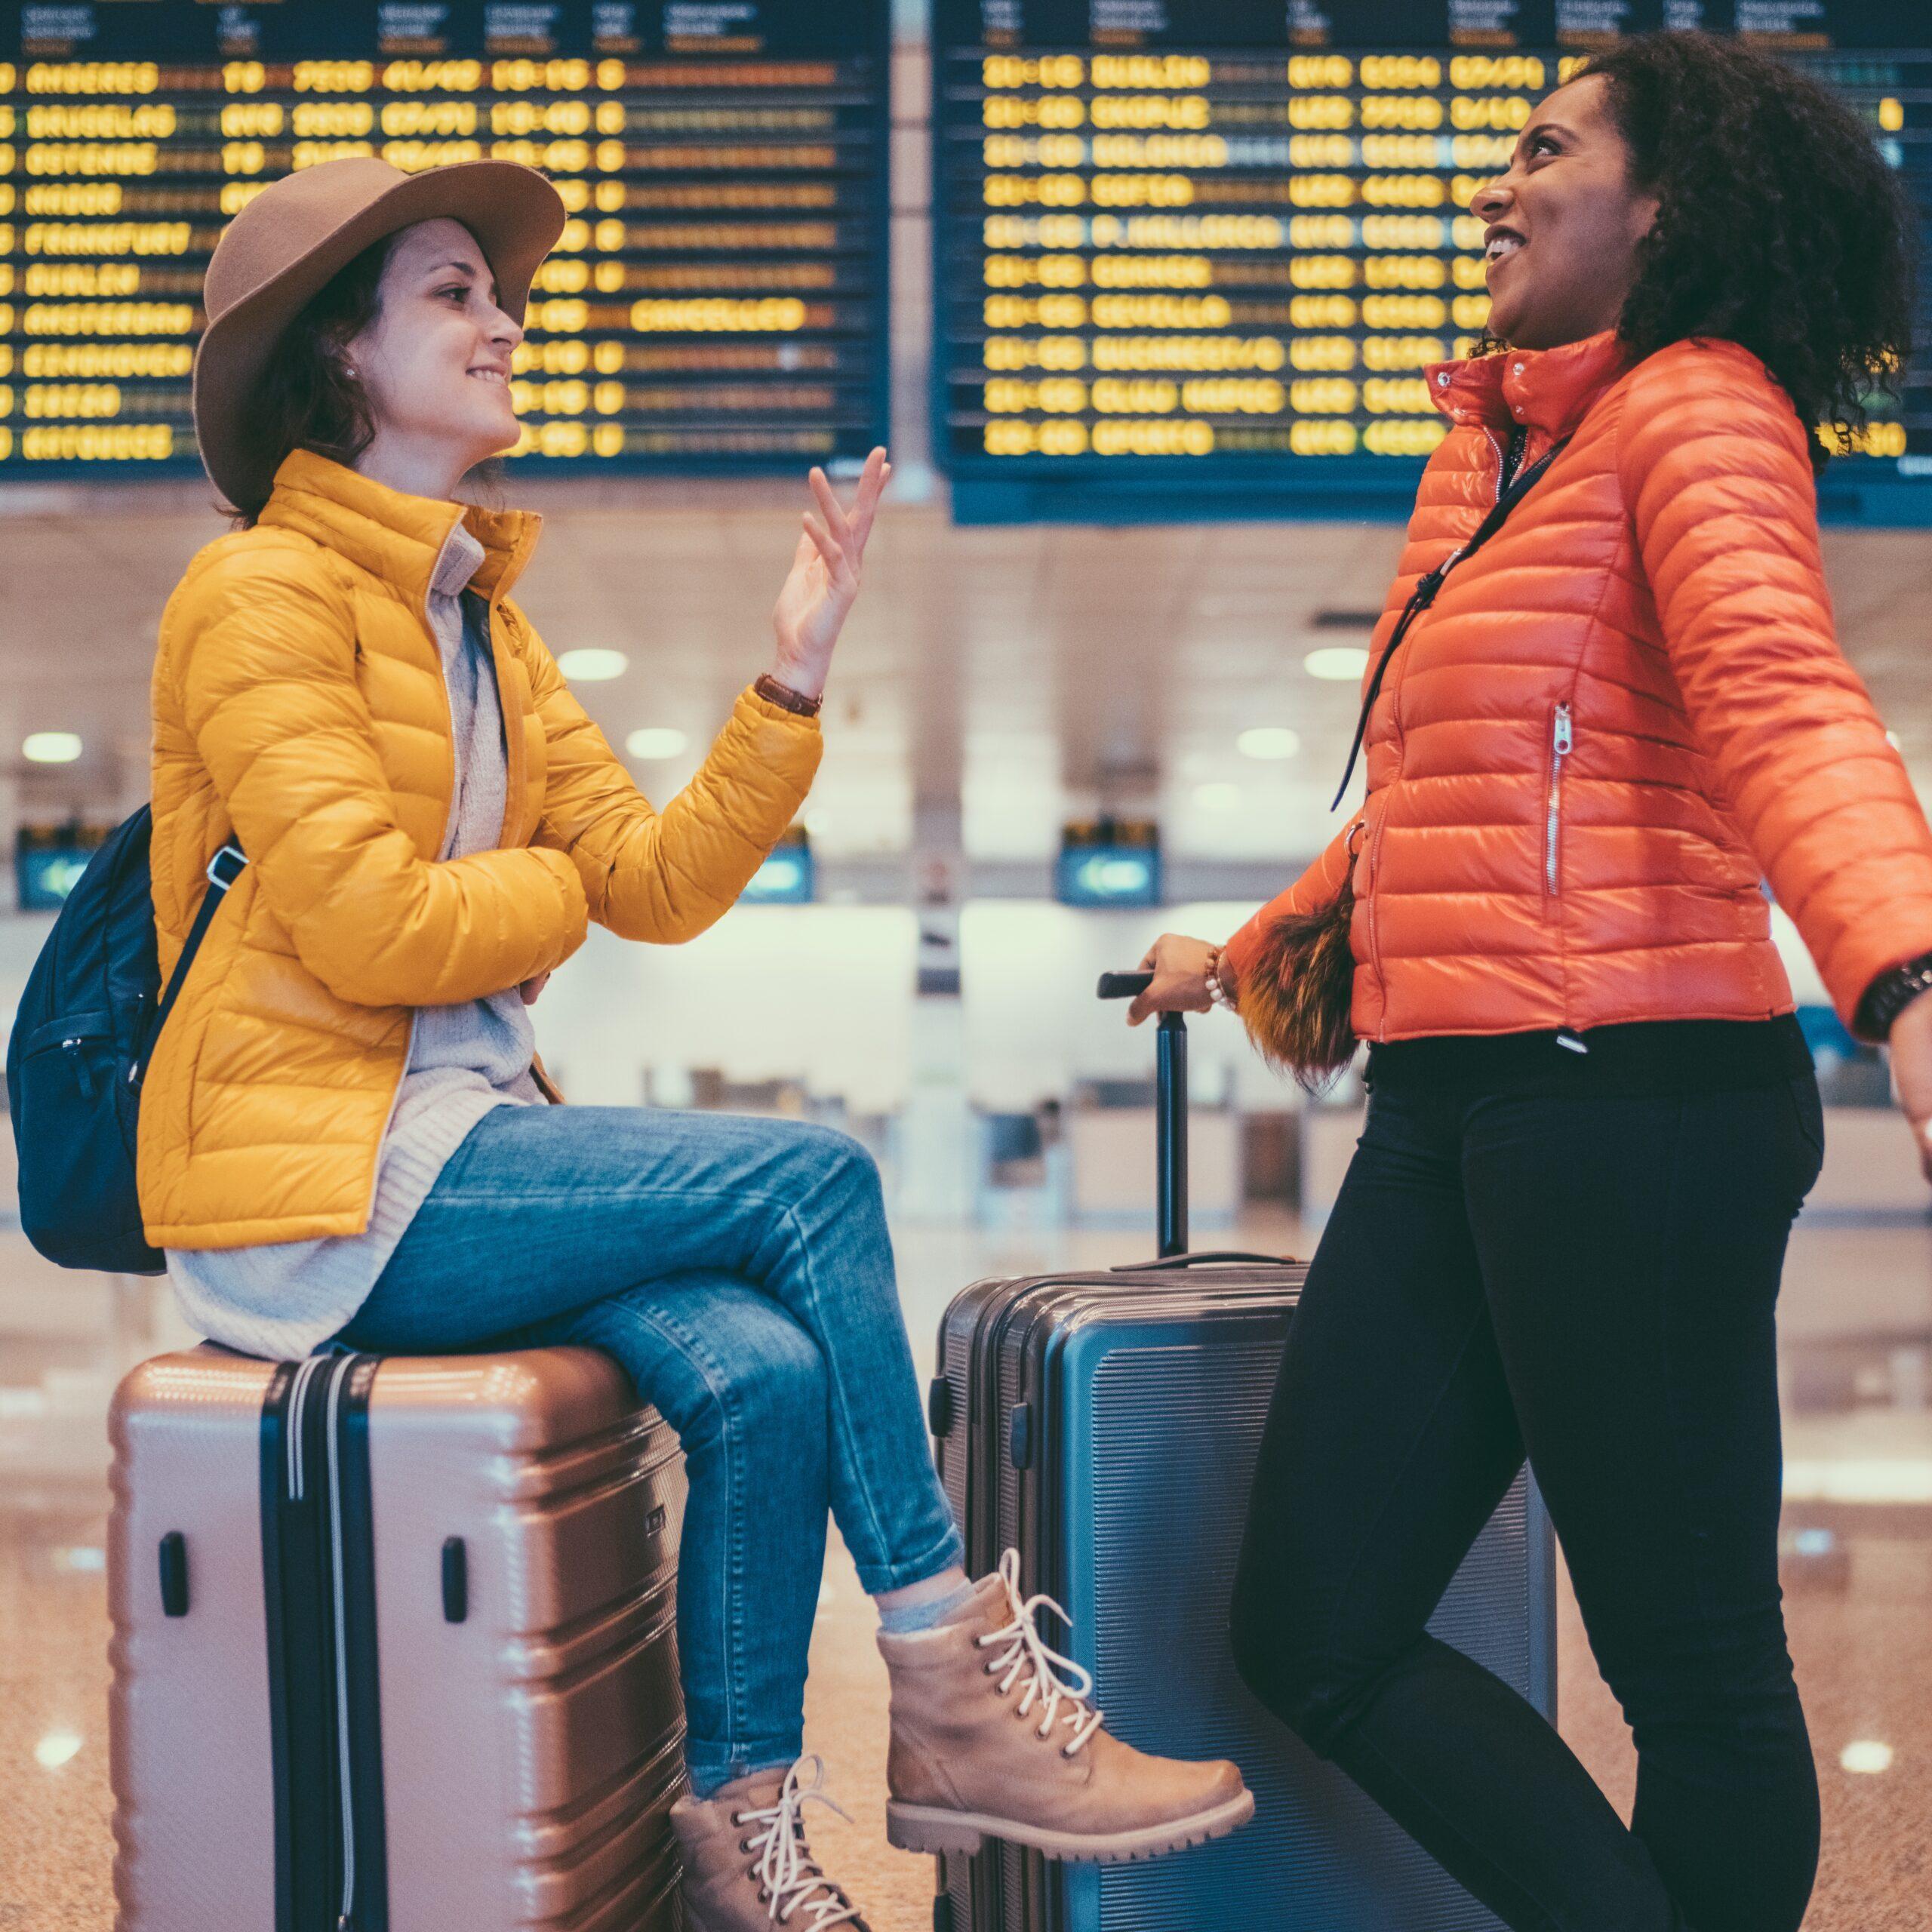 Girls At Airport